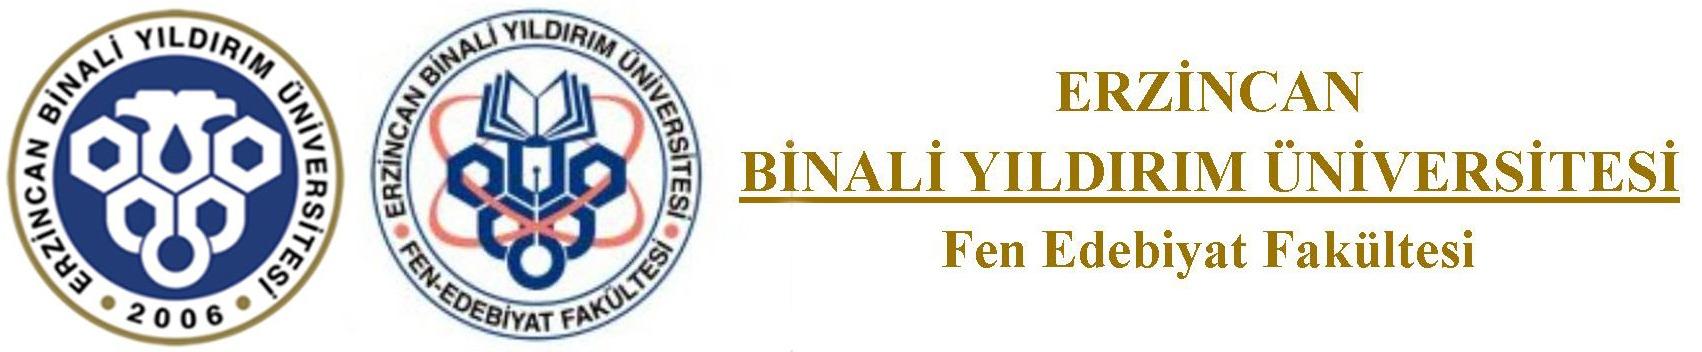 Fen Edebiyat Fakültesi